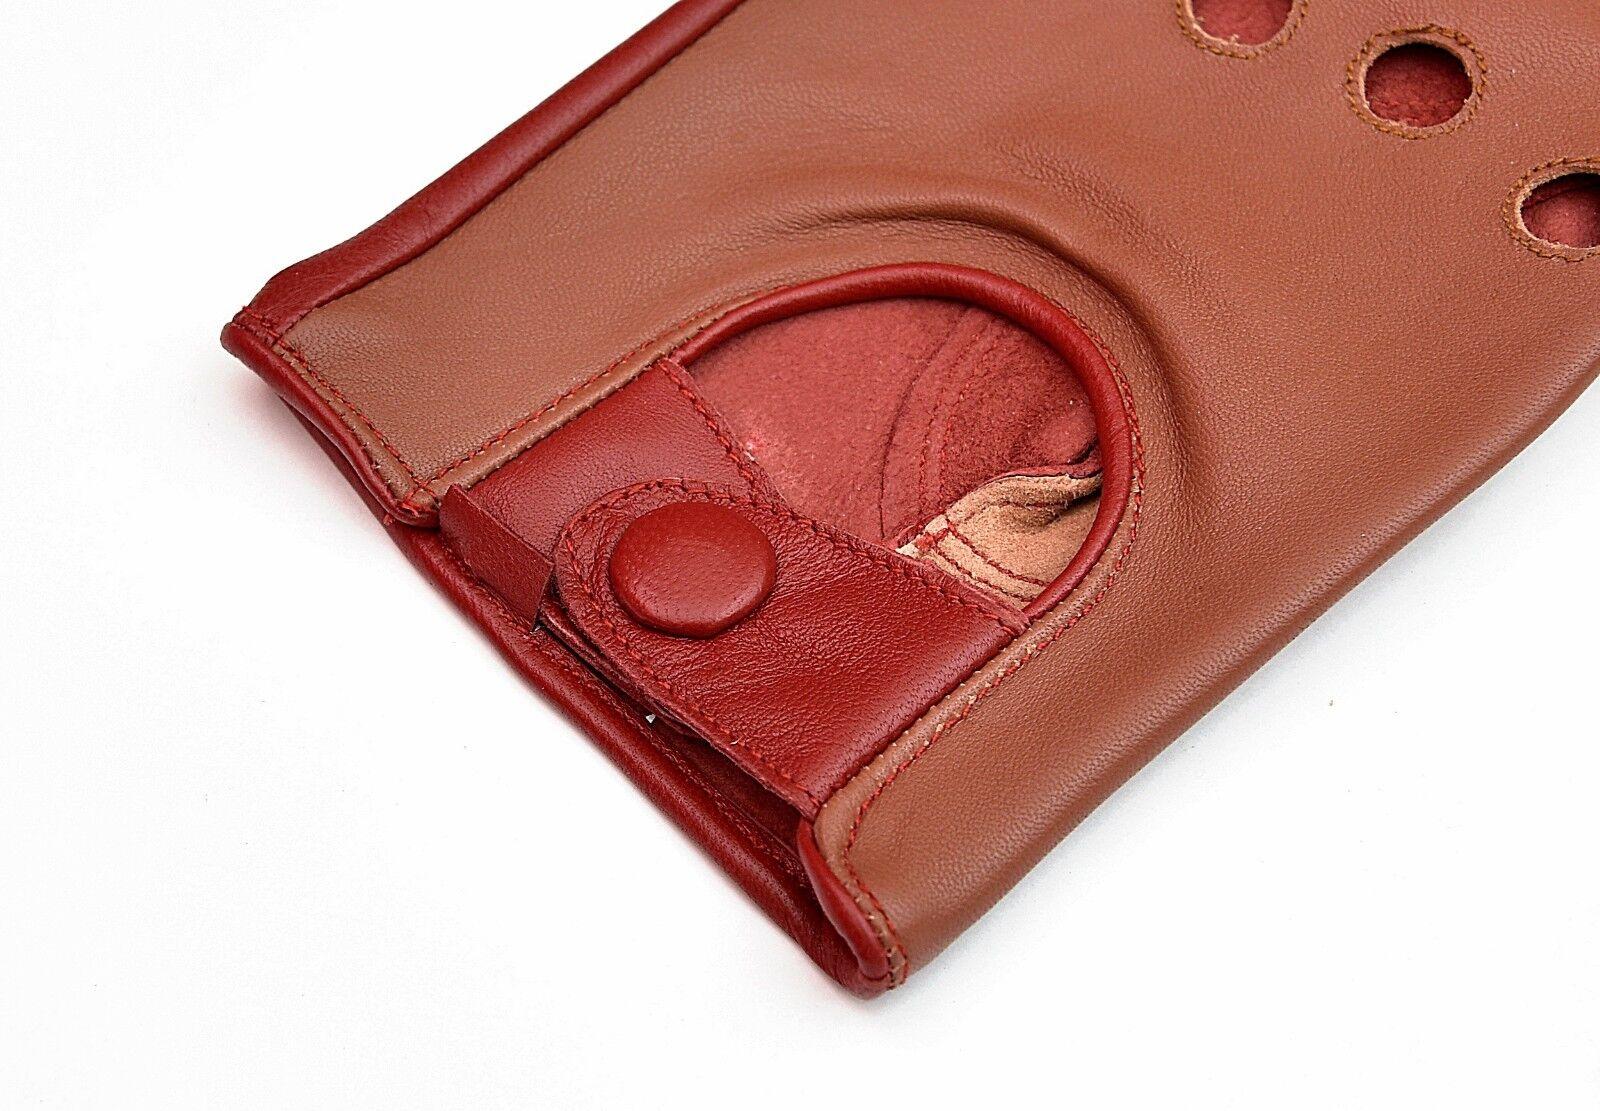 Zweiton Nicht Gefüttert Leder Fahrhandschuhe | Grüne, Grüne, Grüne, neue Technologie  31982a